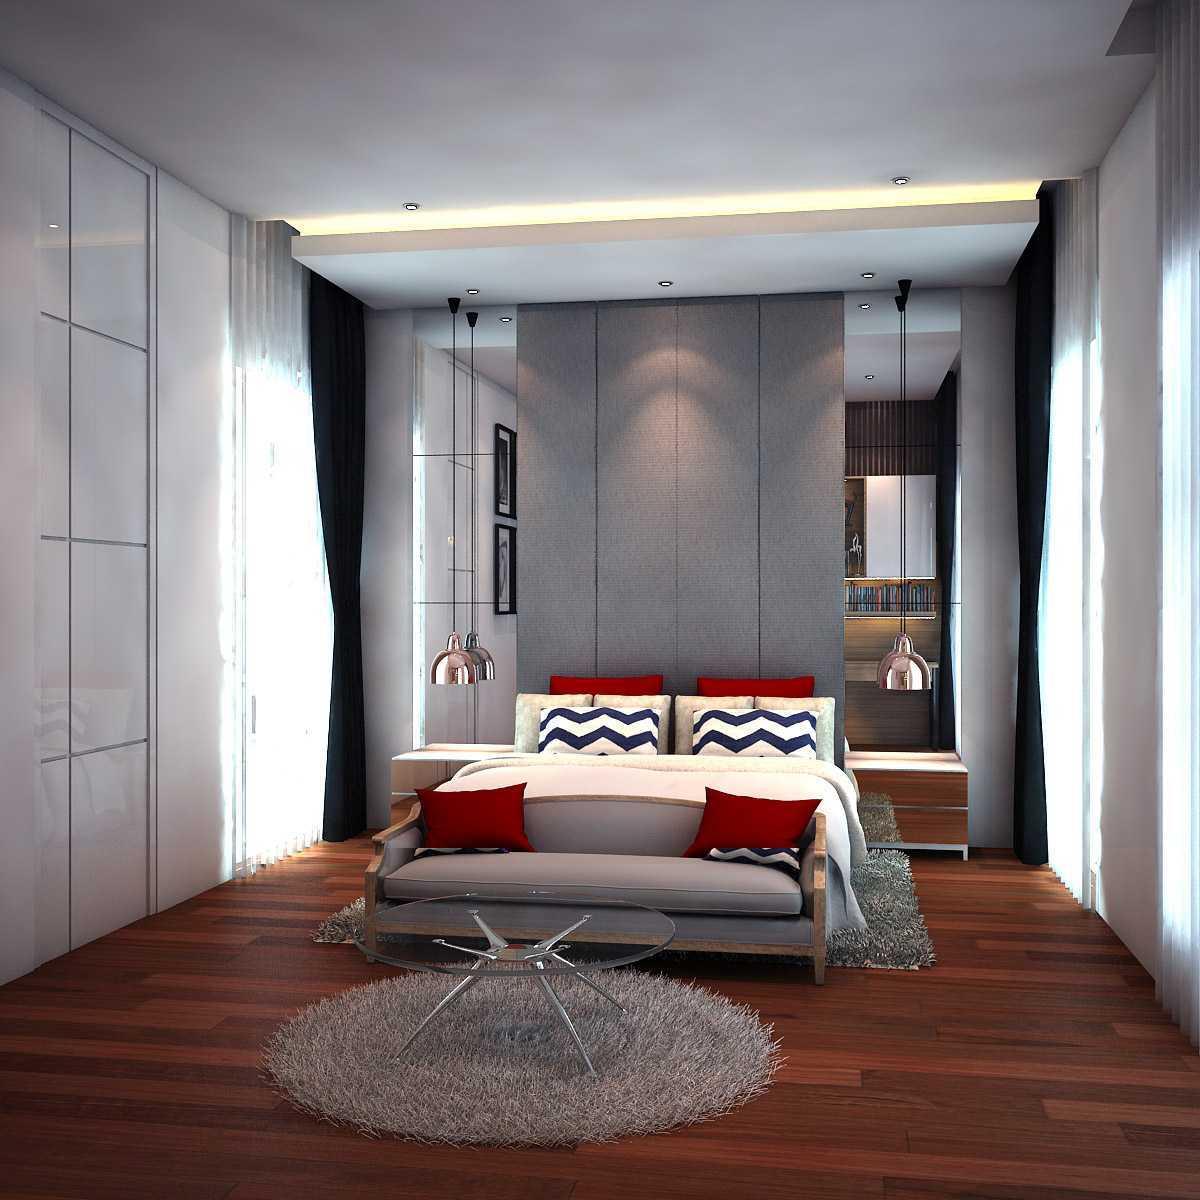 Aditya Wira Hardi Modern Master Bedroom, Medokan Surabaya Surabaya, Kota Sby, Jawa Timur, Indonesia Surabaya, Kota Sby, Jawa Timur, Indonesia Aditya-Wira-Hardi-Modern-Master-Bedroom-Medokan-Surabaya   65945